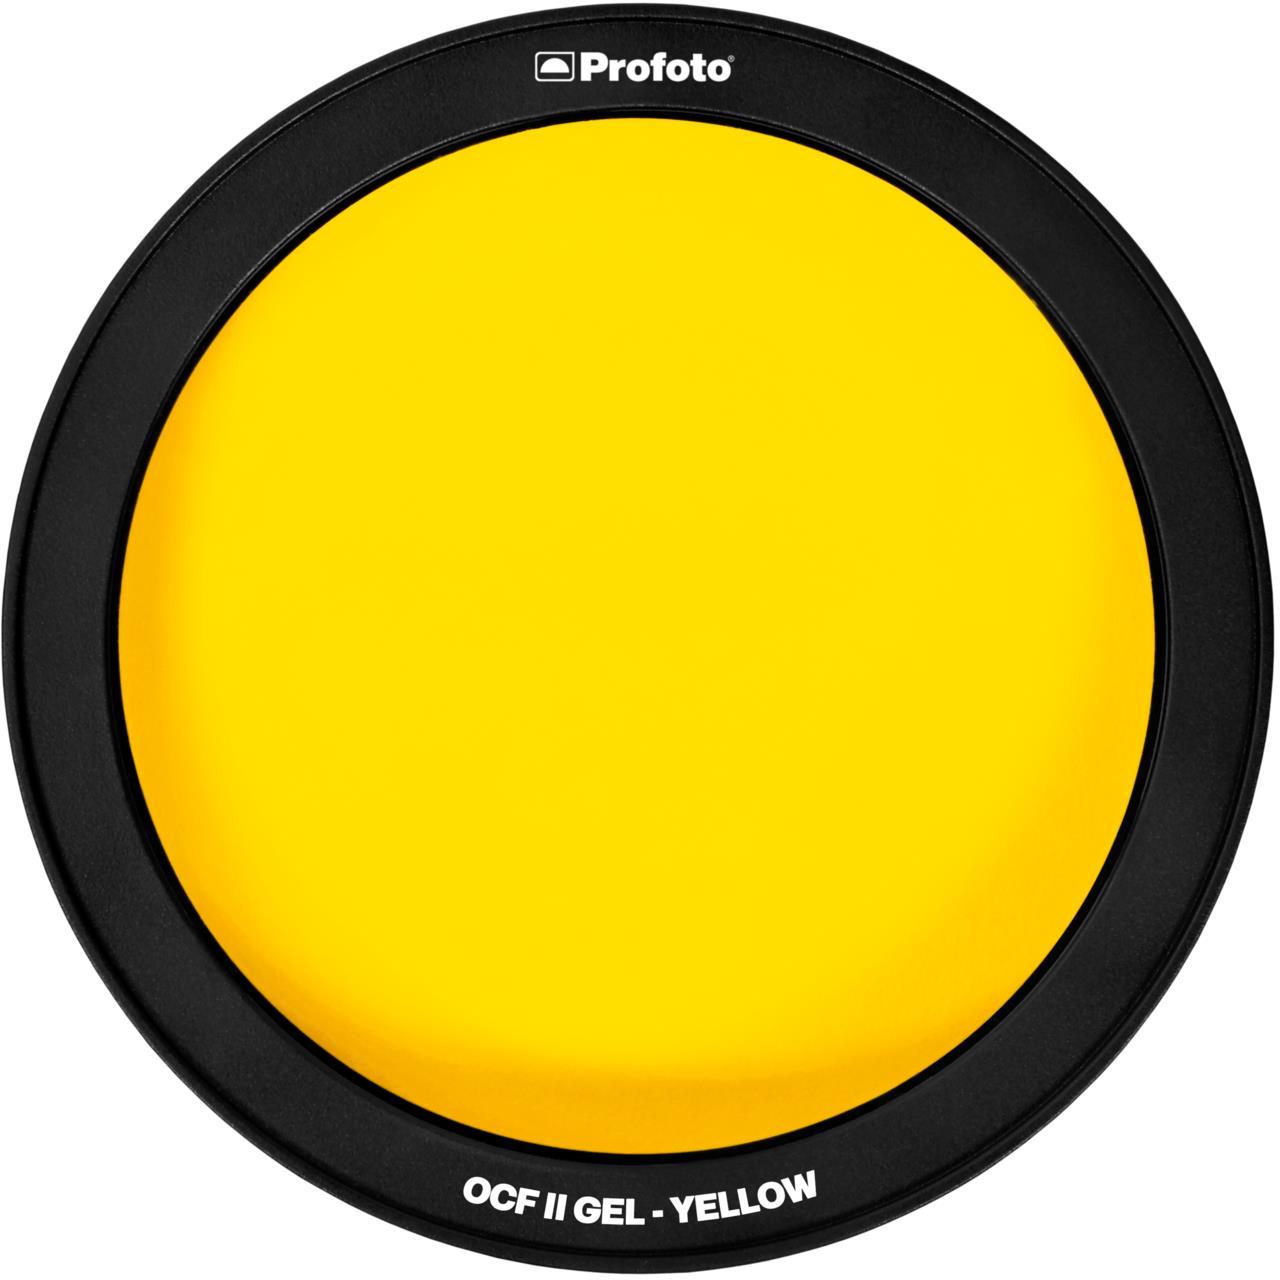 Profoto OCF II Gel - Yellow